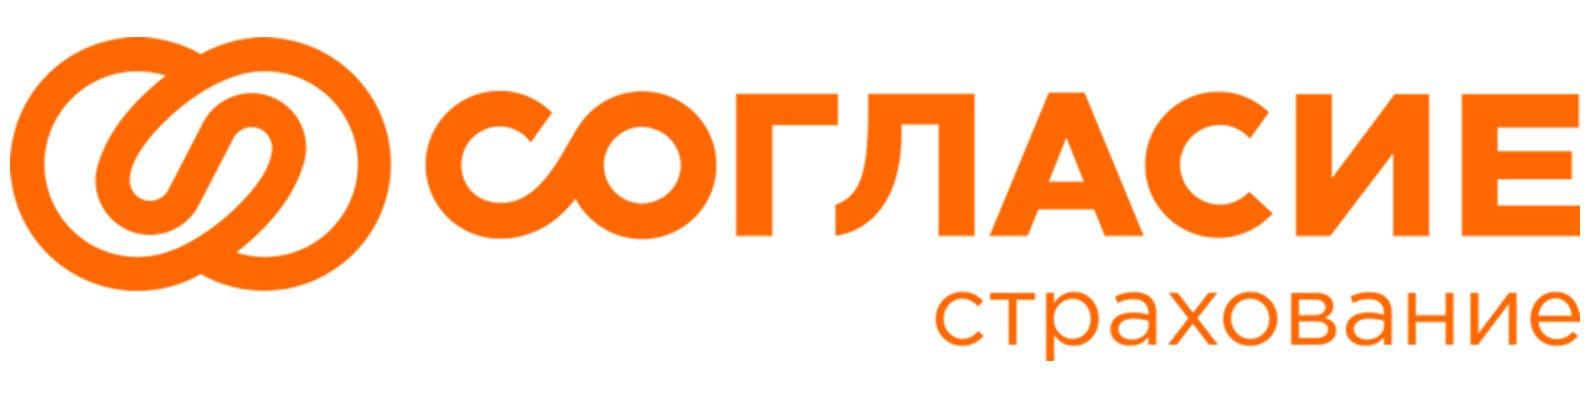 ООО «СК «Согласие»